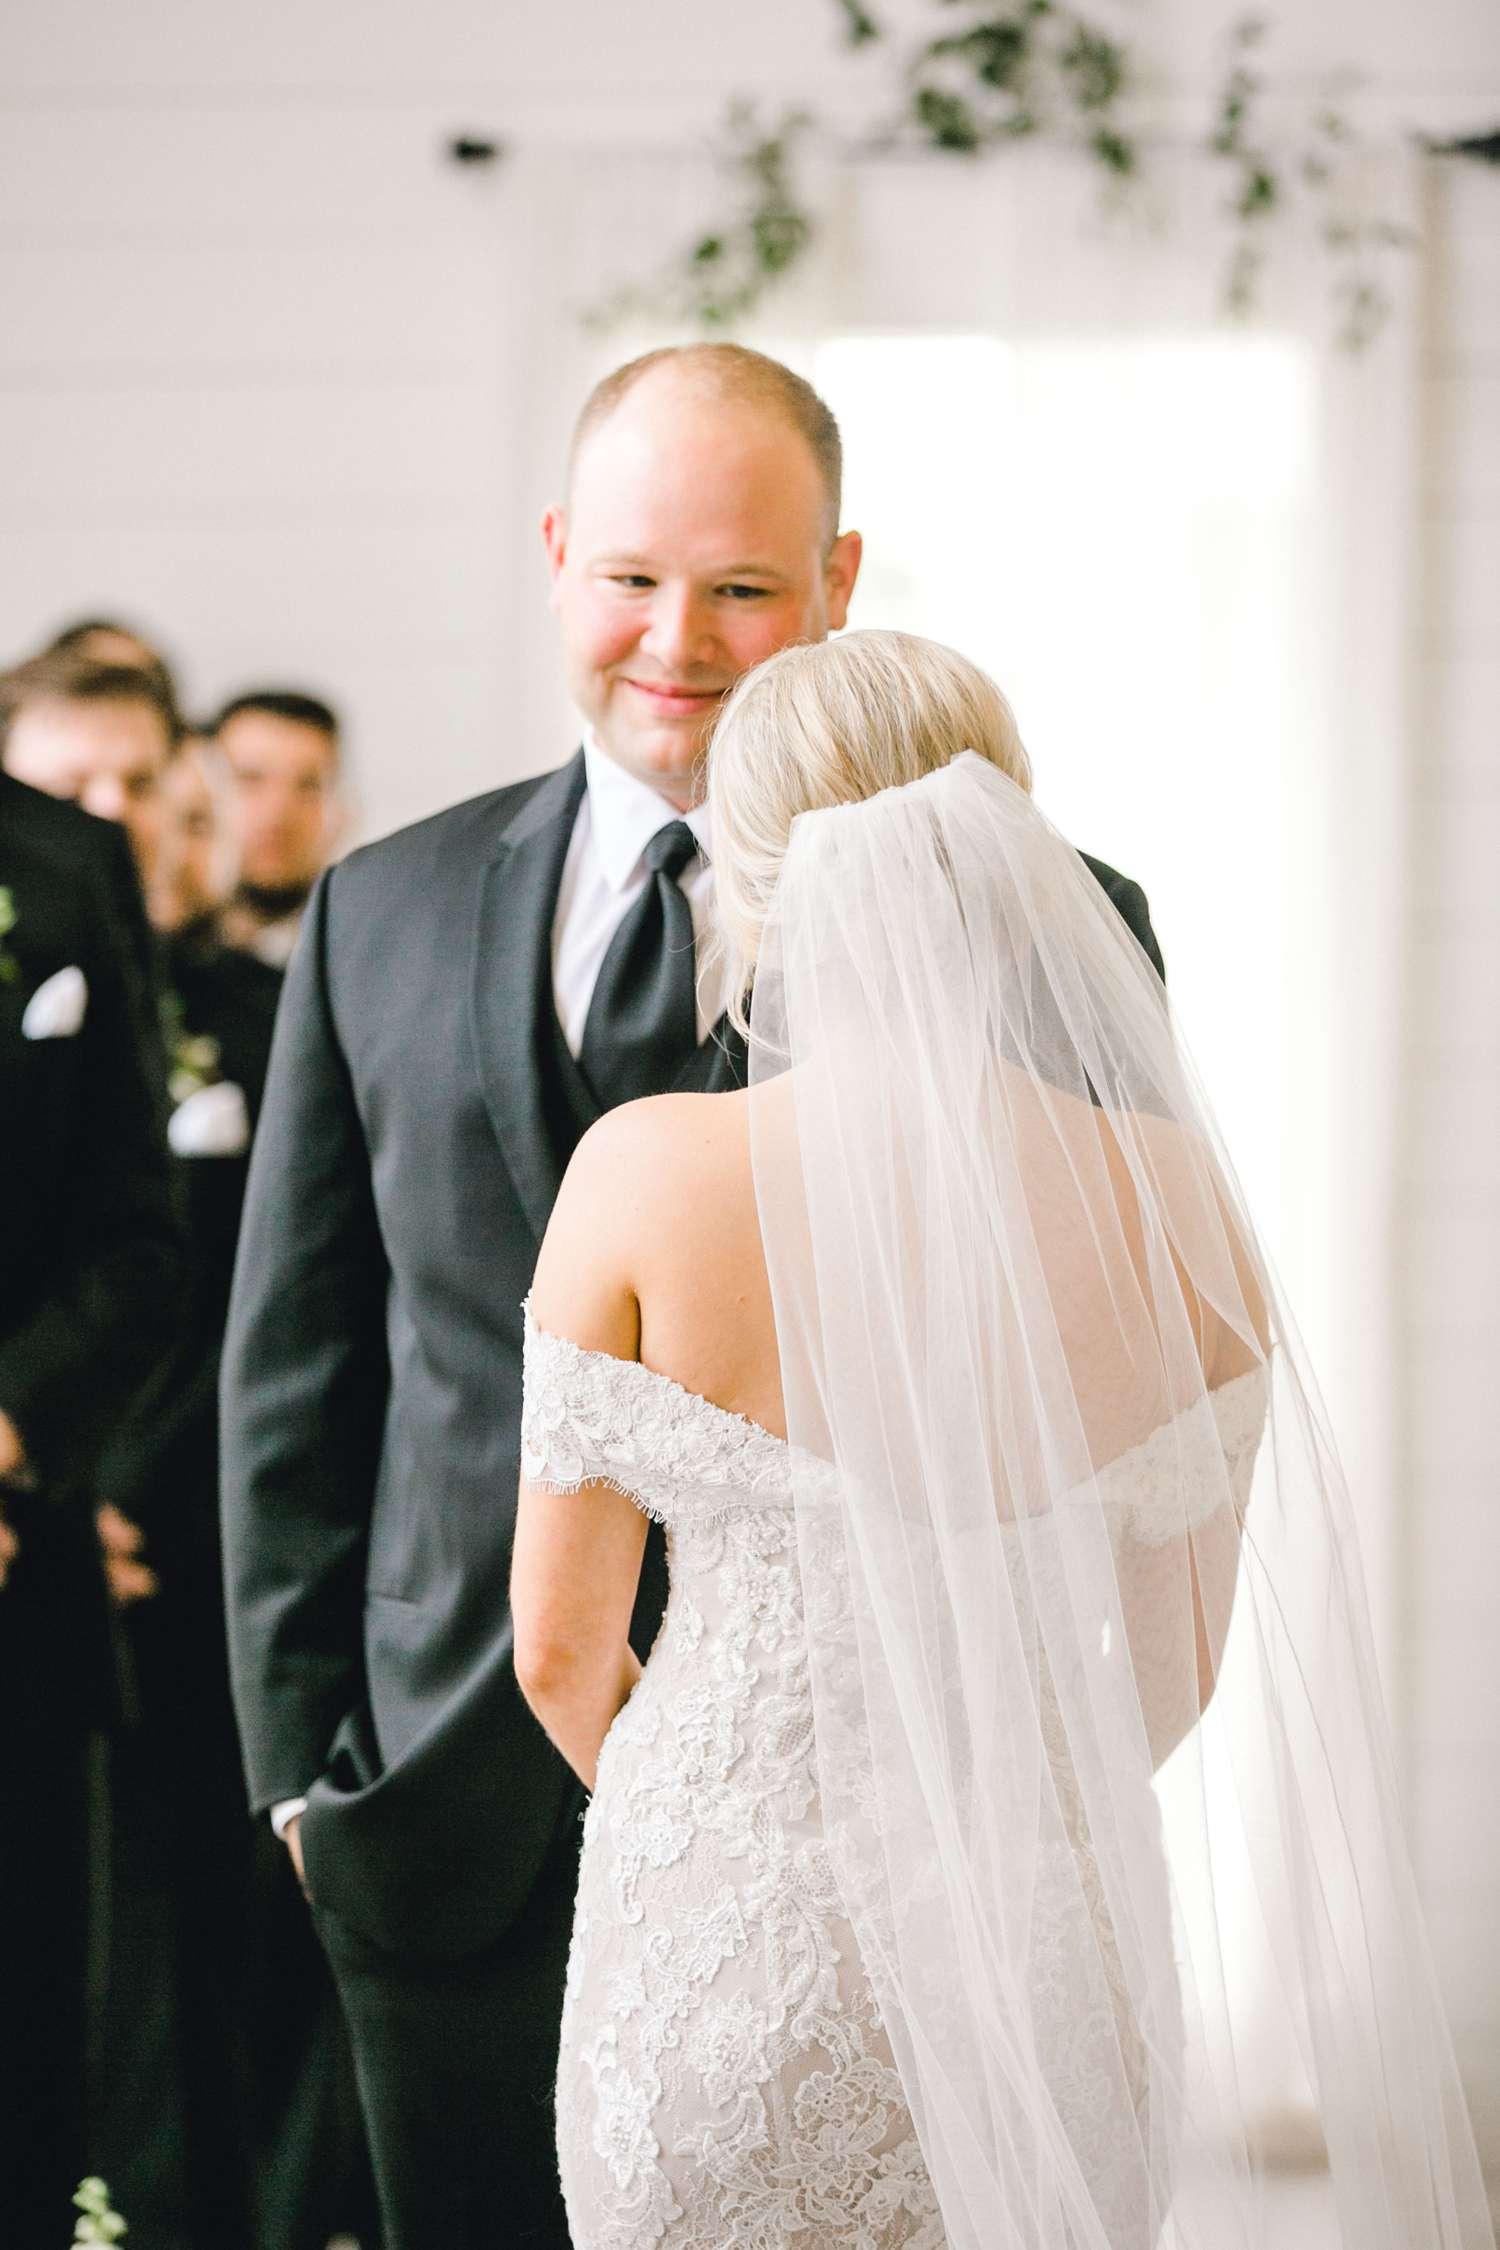 HEBERT_MORGAN_AND_CLAY_ALLEEJ_THE_FARMHOUSE_MONTGOMERY_TEXAS_WEDDING_0100.jpg